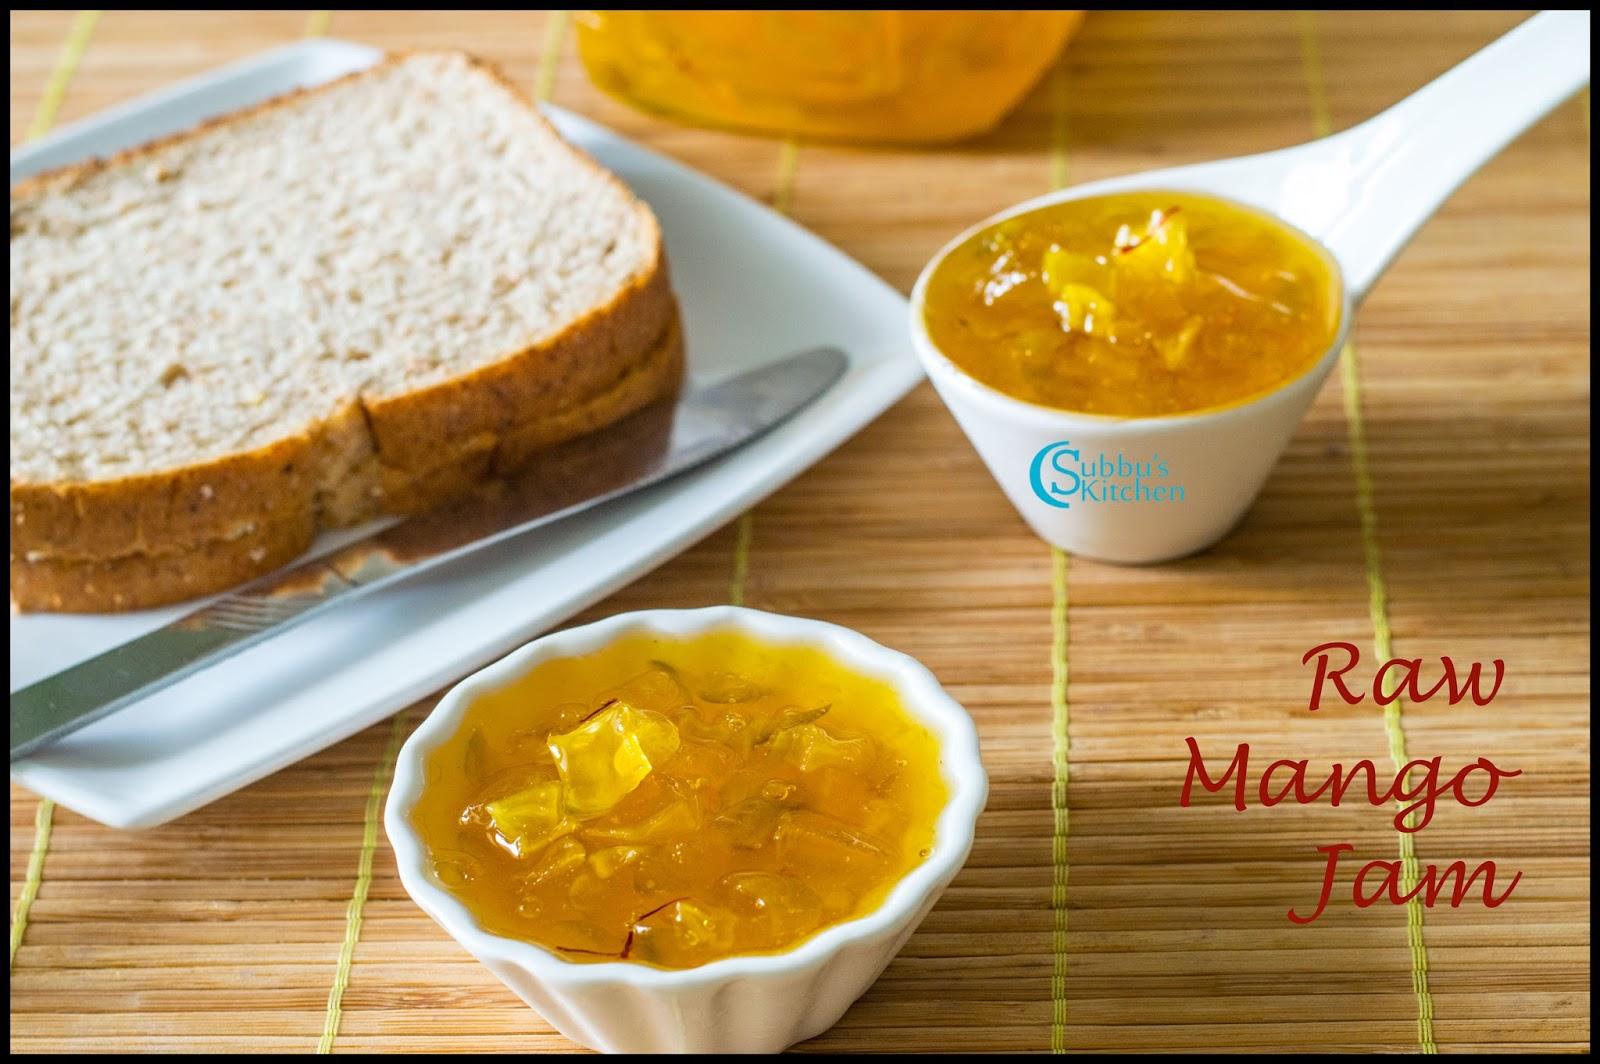 Raw Mango Jam - Subbus Kitchen